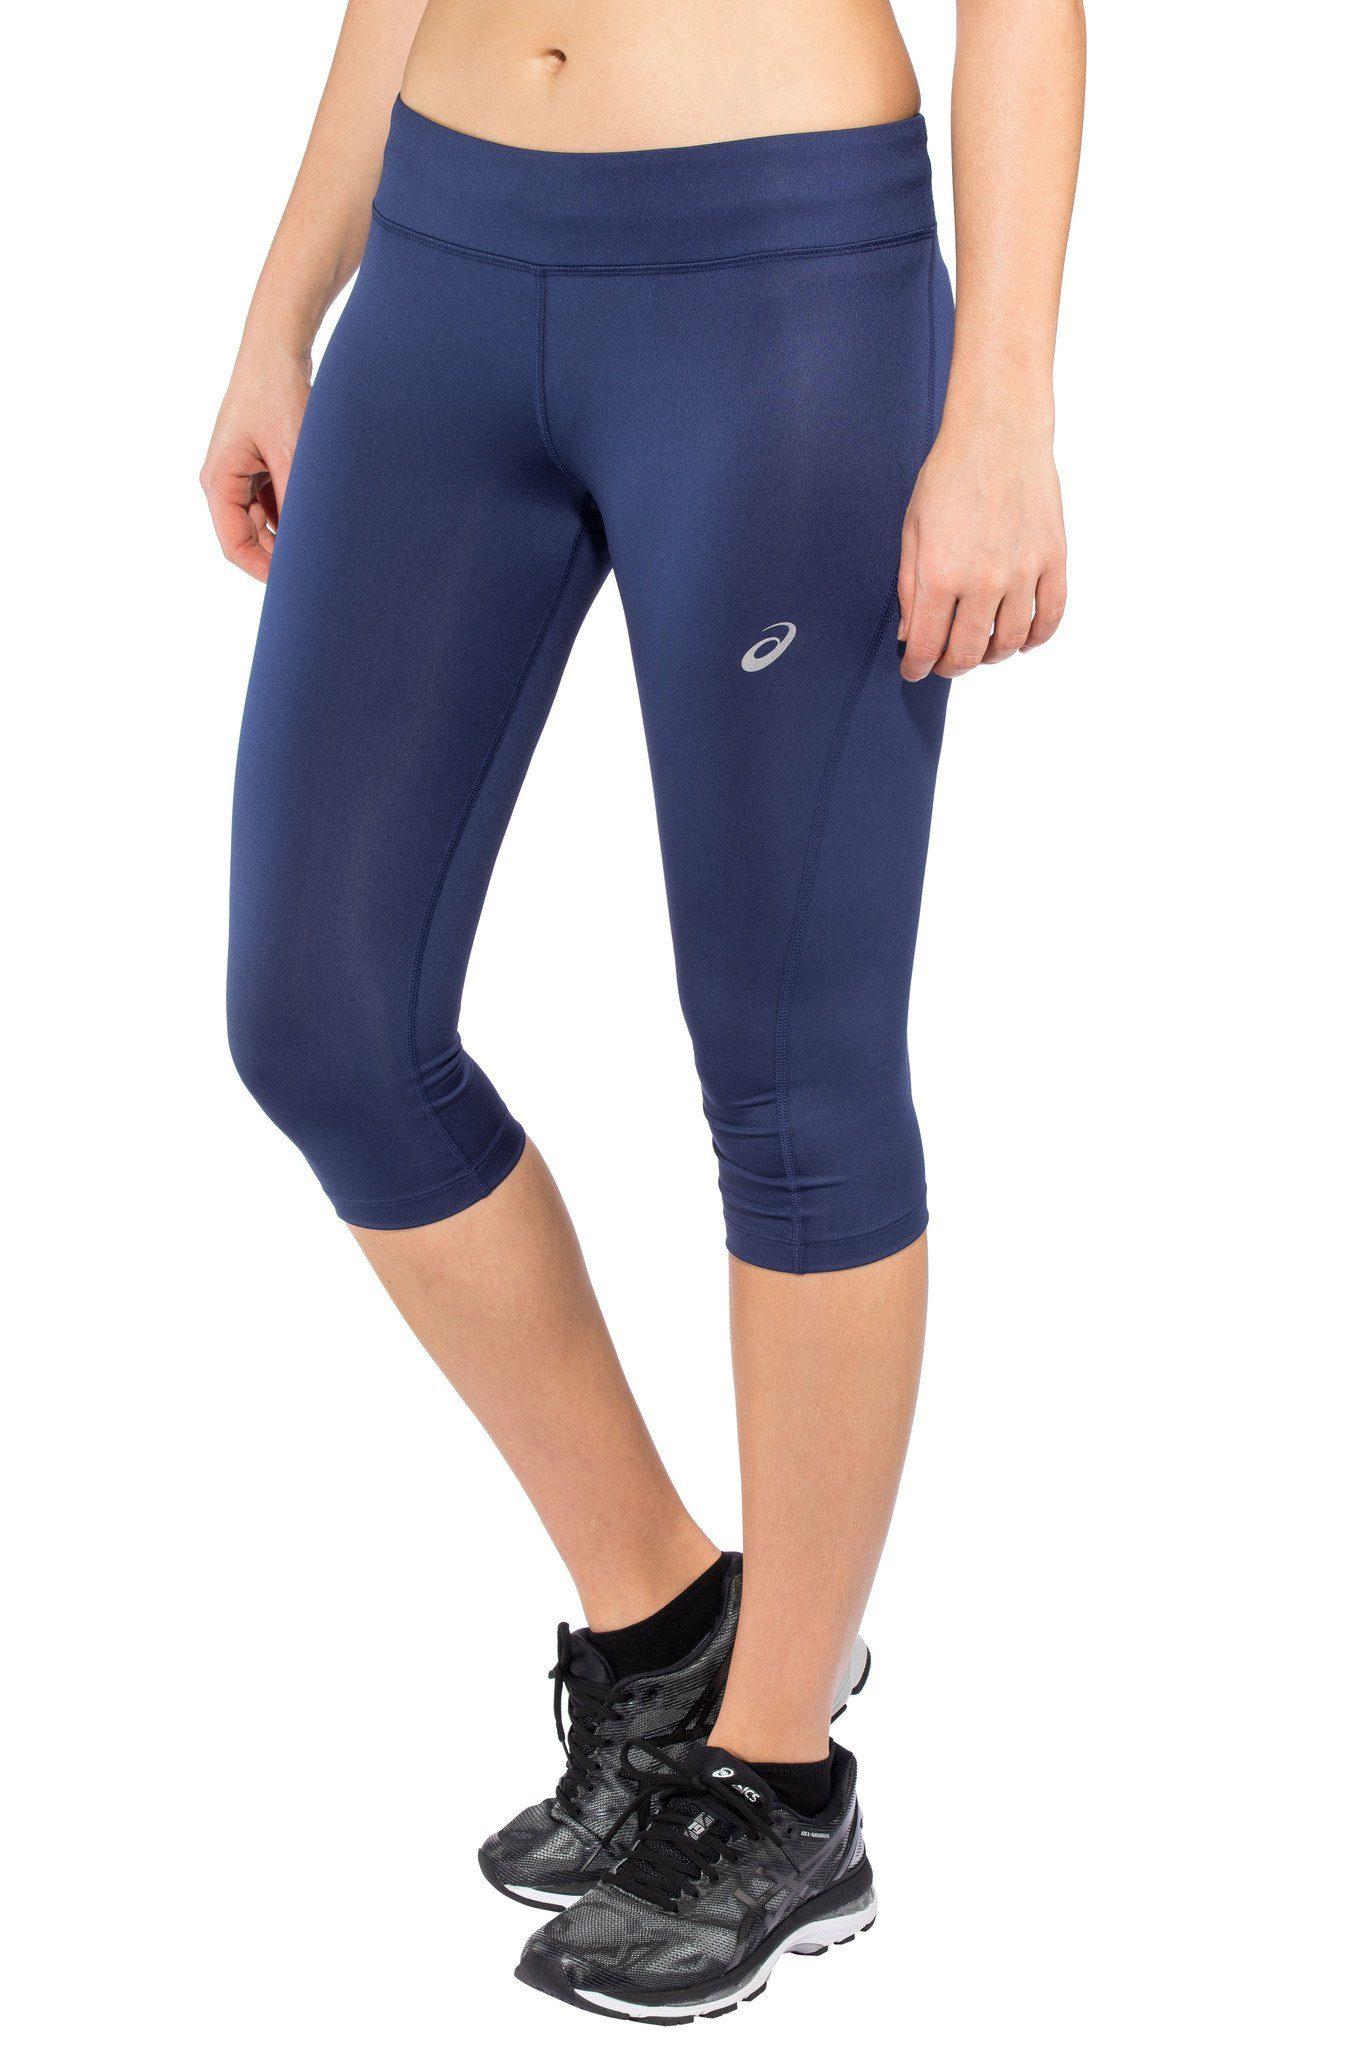 Tights KaufenOtto »silver Knee Hose Asics Damen« 9D2EHI